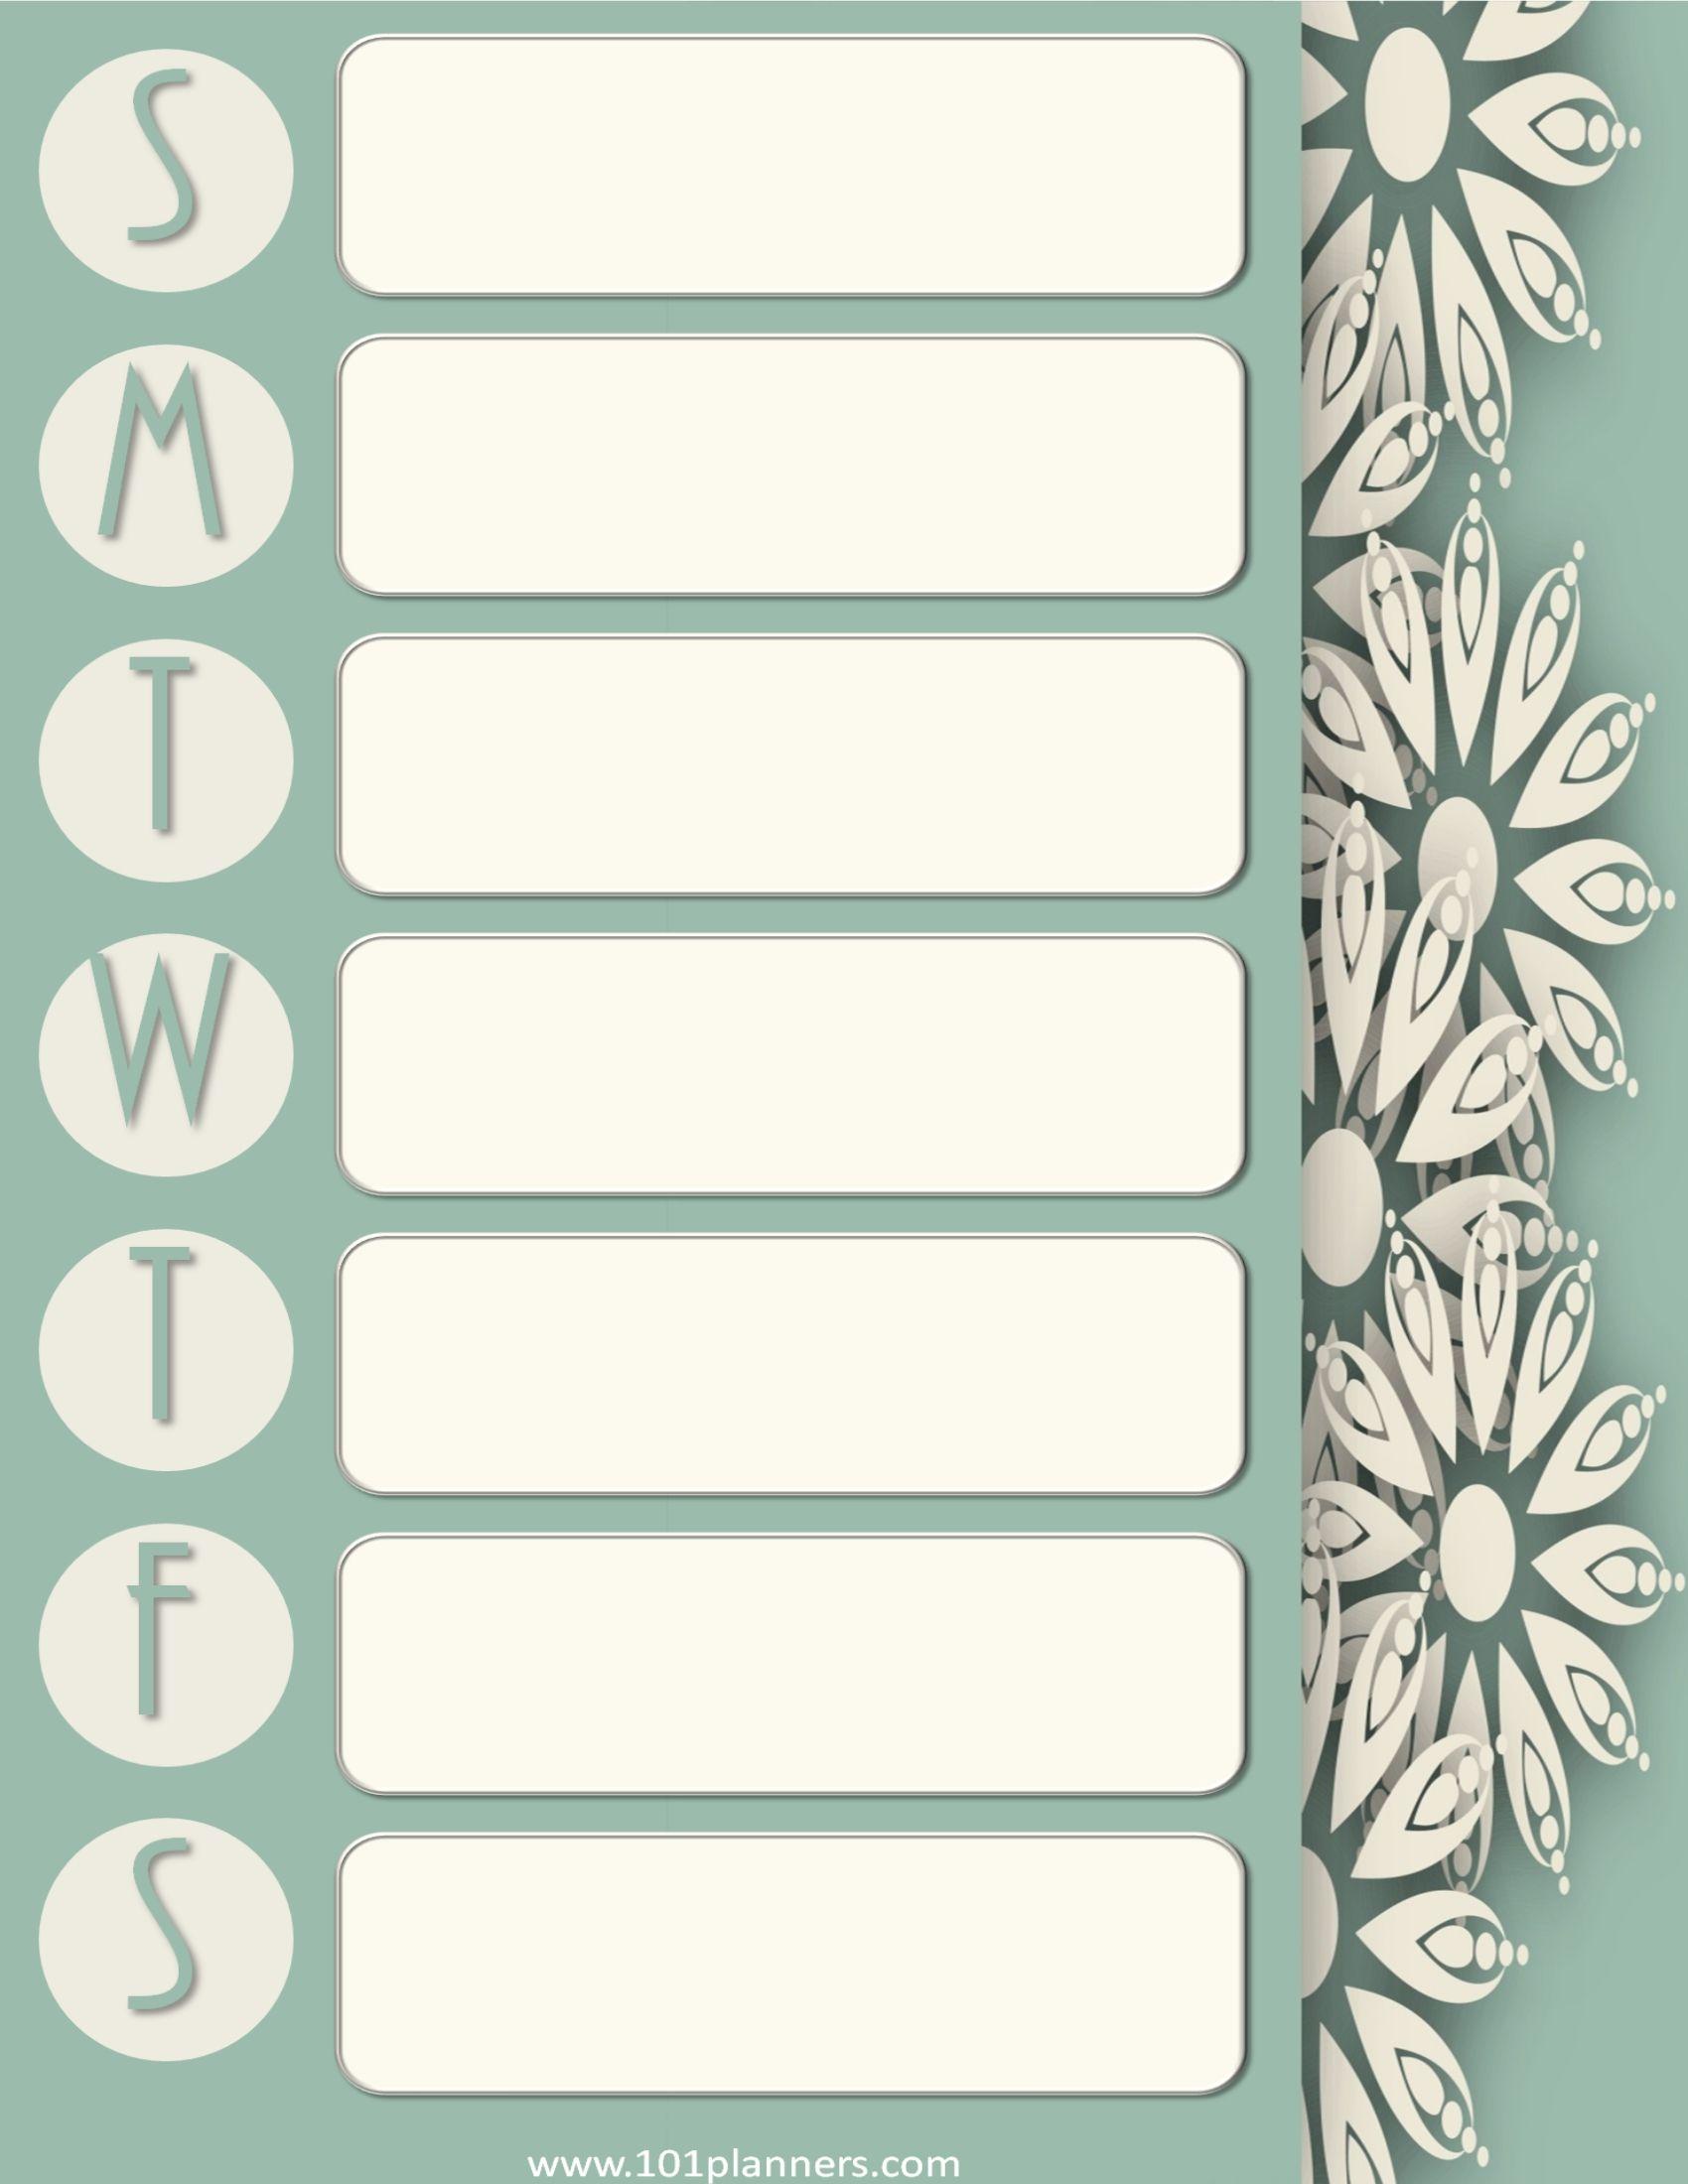 Weekly Calendar   Weekly calendar, Weekly calendar ...